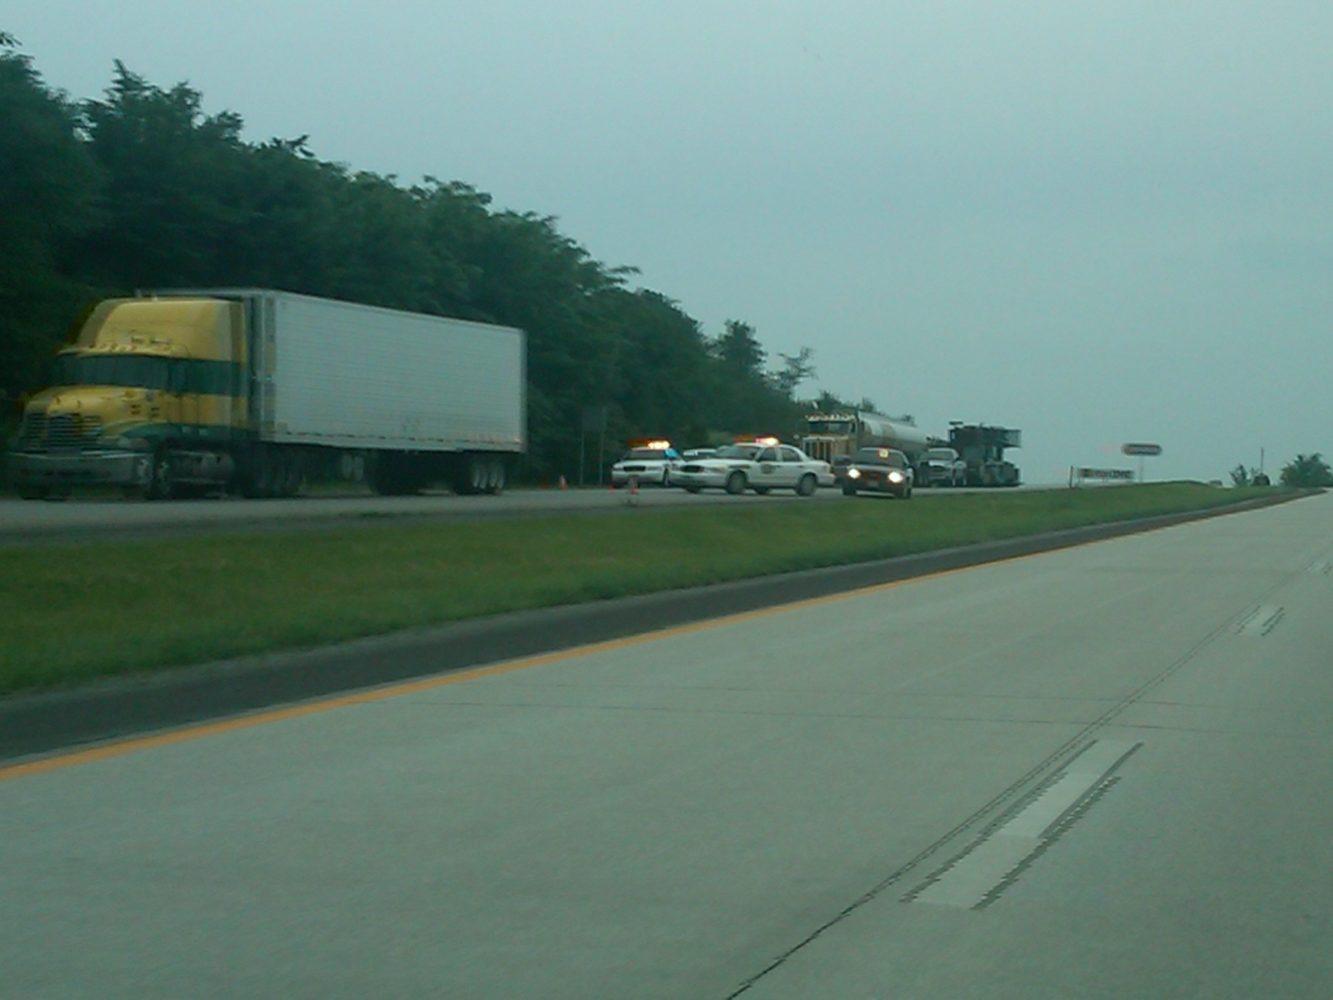 Interstate 435 closed when body found in car